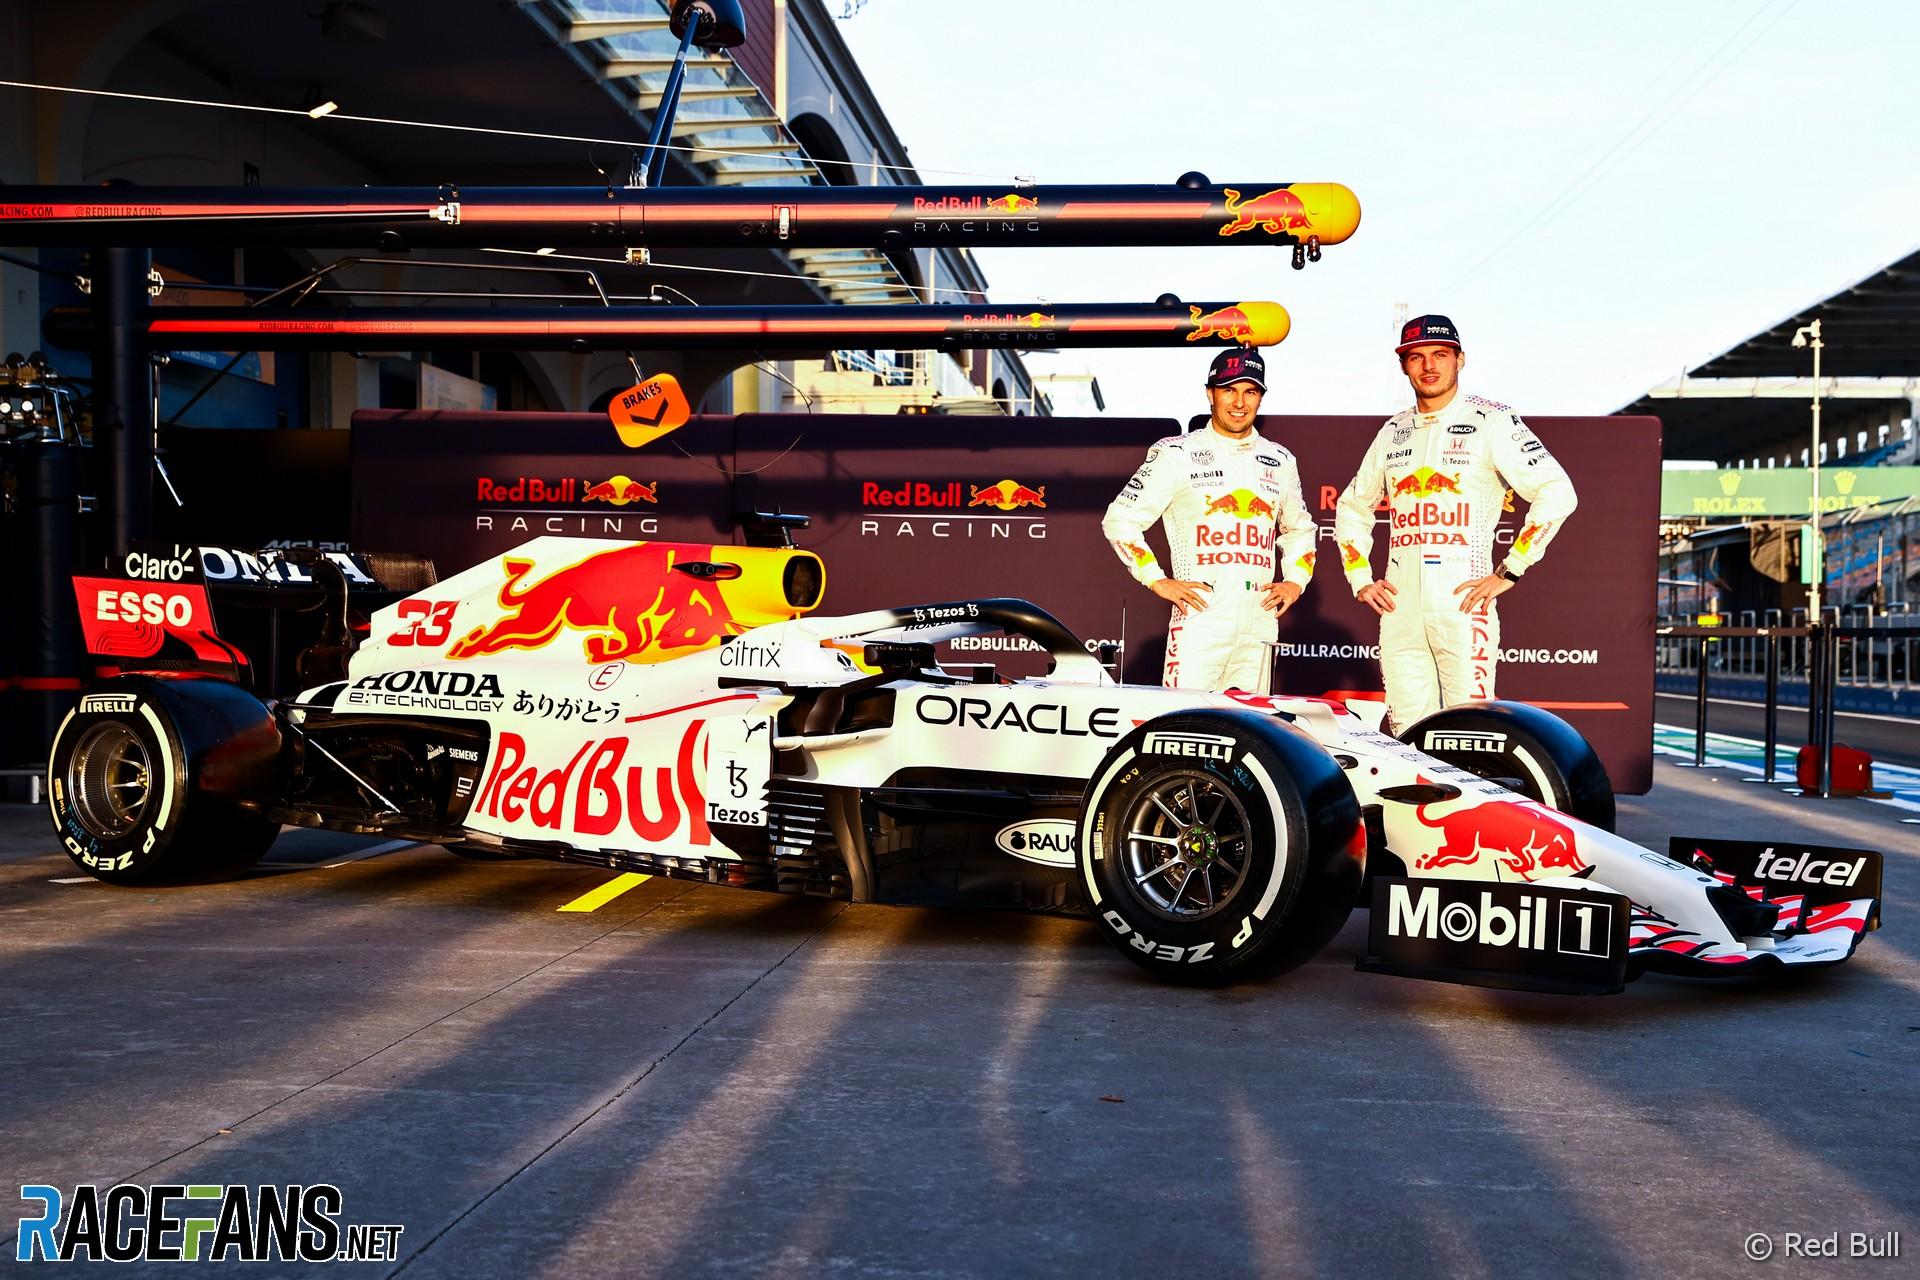 Sergio Perez, Max Verstappen, Red Bull, Istanbul Park, 2021